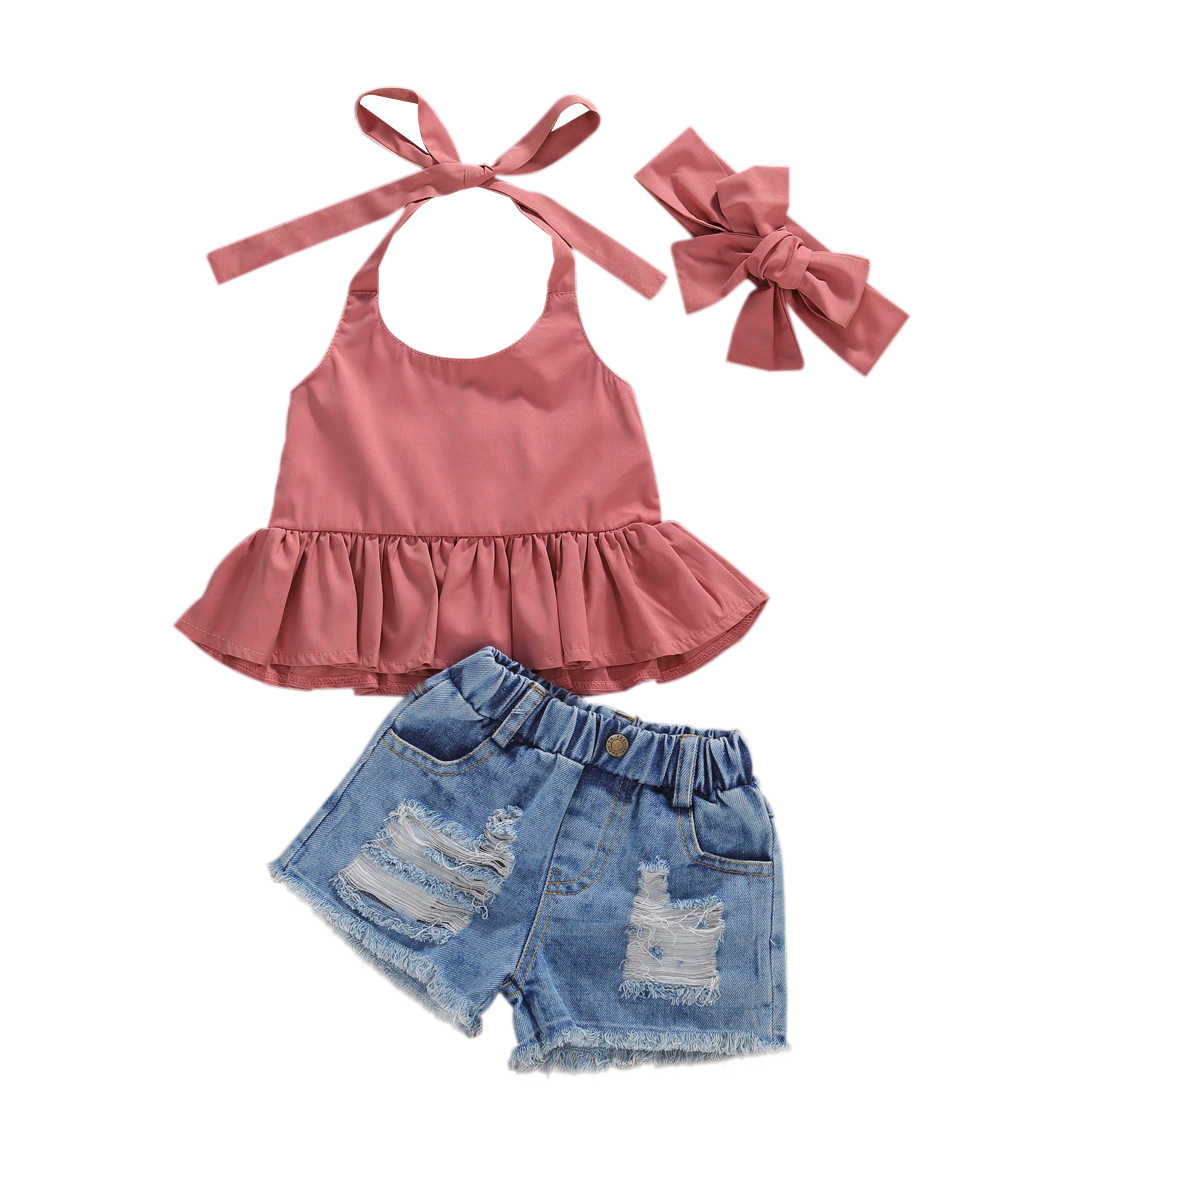 Toddler Baby Girl Halter Crop Top+Ribbed Denim Shorts 2pcs Summer Outfits Clothes Set